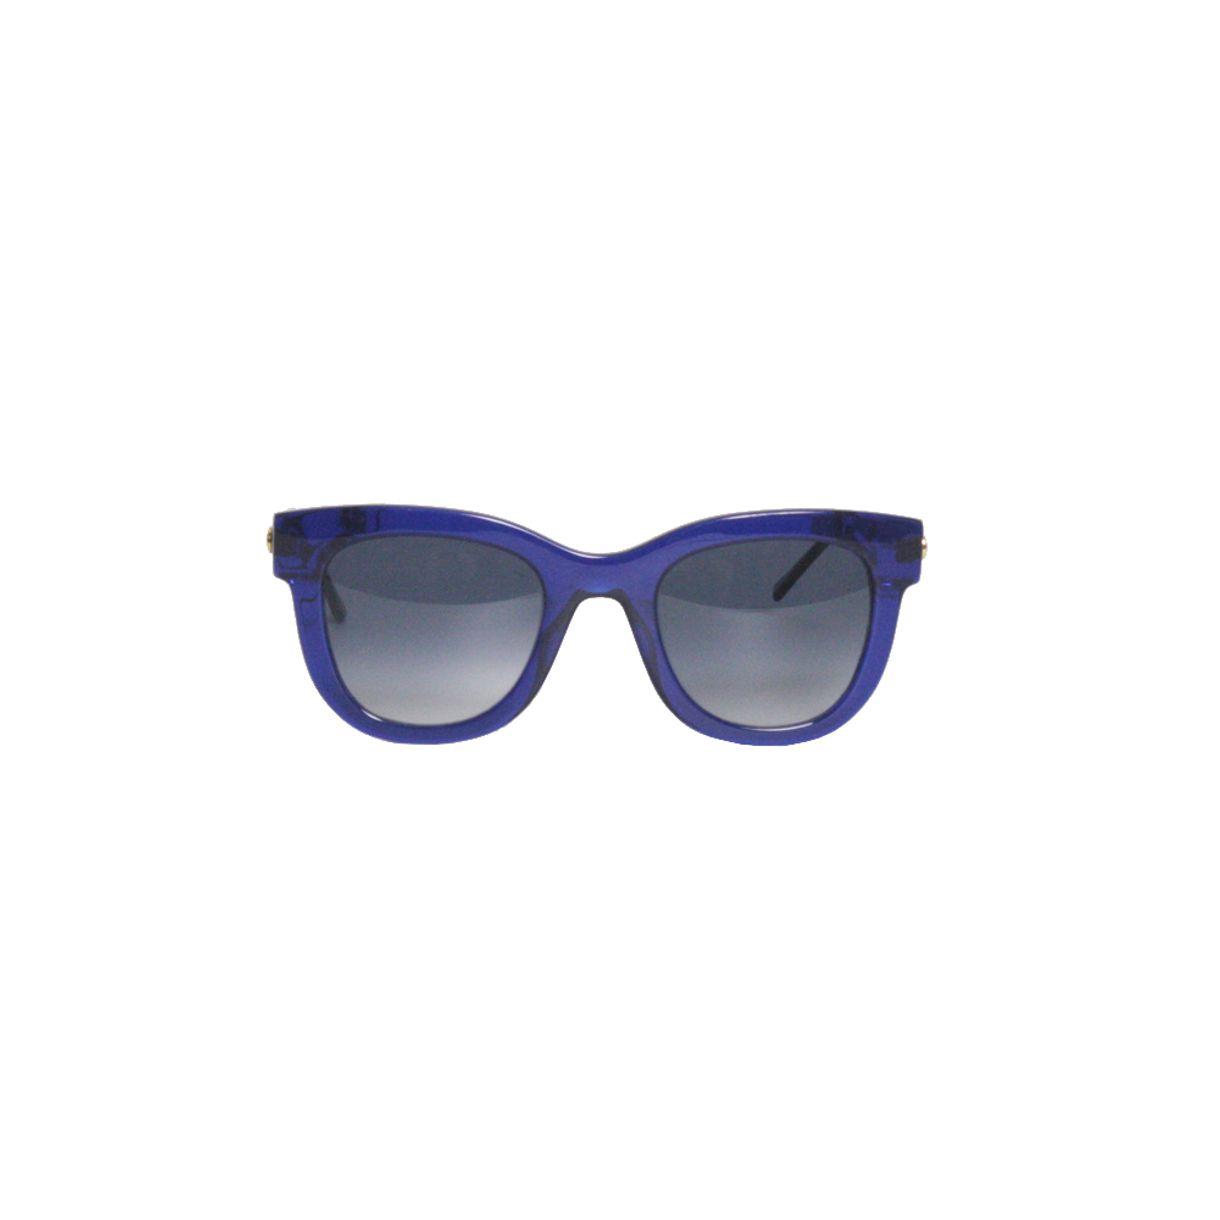 Oculos-Thierry-Lasry-Sexxxy-Azul-Bic